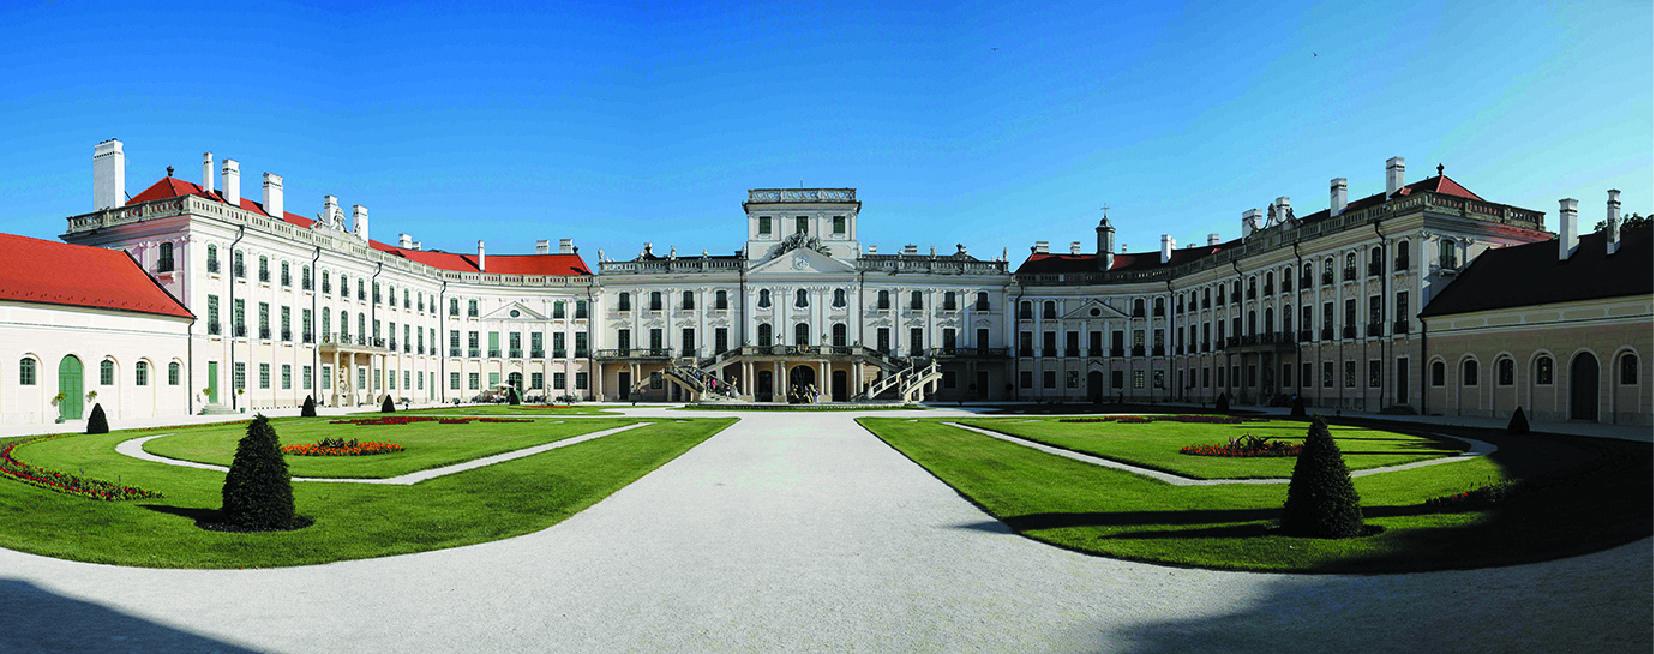 Дворец Эстерхази (фотограф Peter Szvitek)